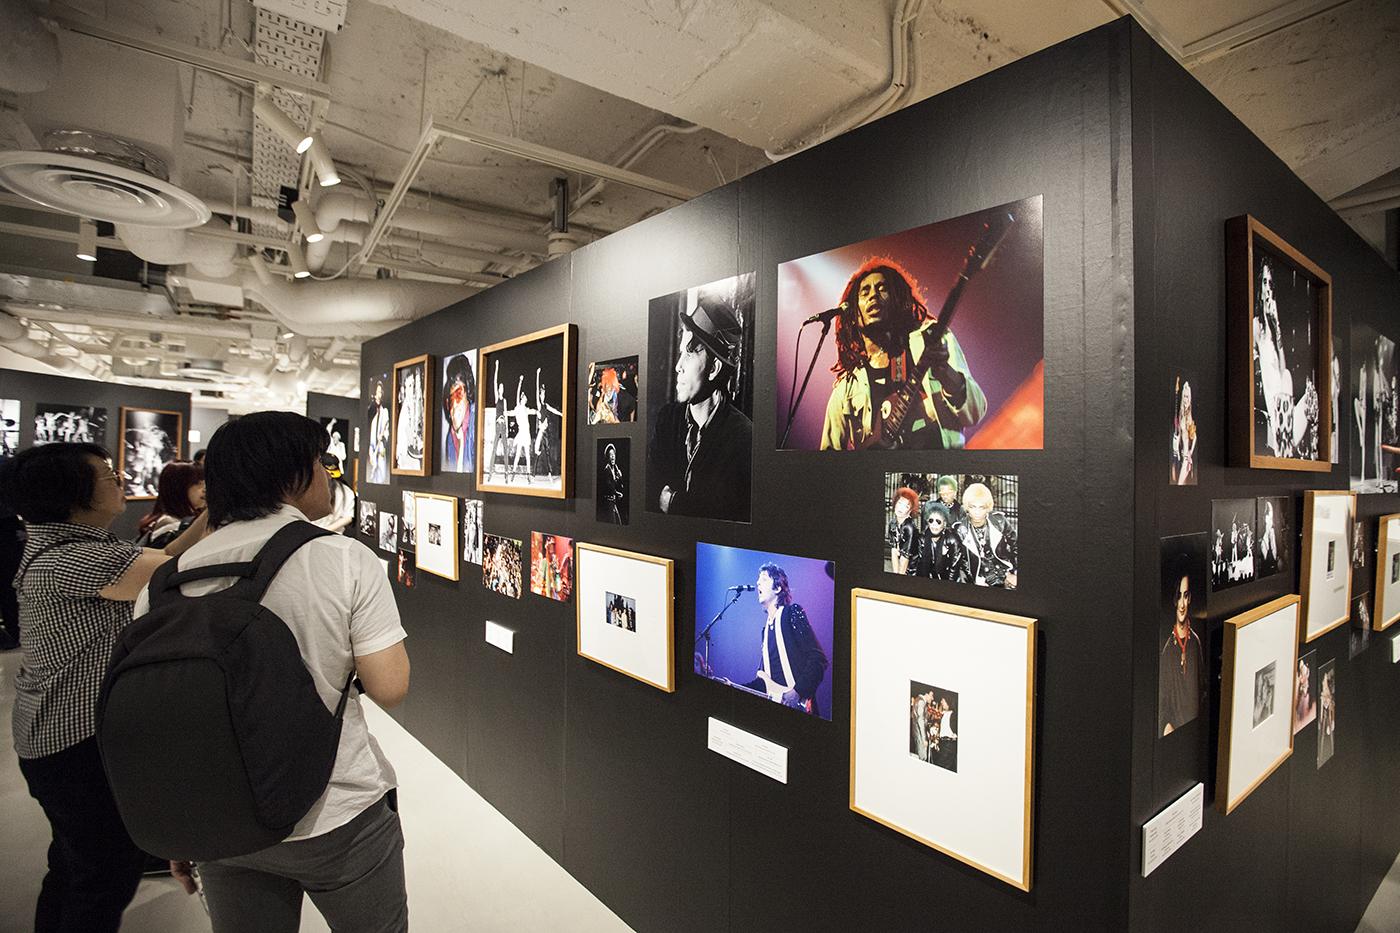 m-0068 【レポート】ロックの歴史が凝縮。フジロックファンも必見のボブ・グルーエン写真展